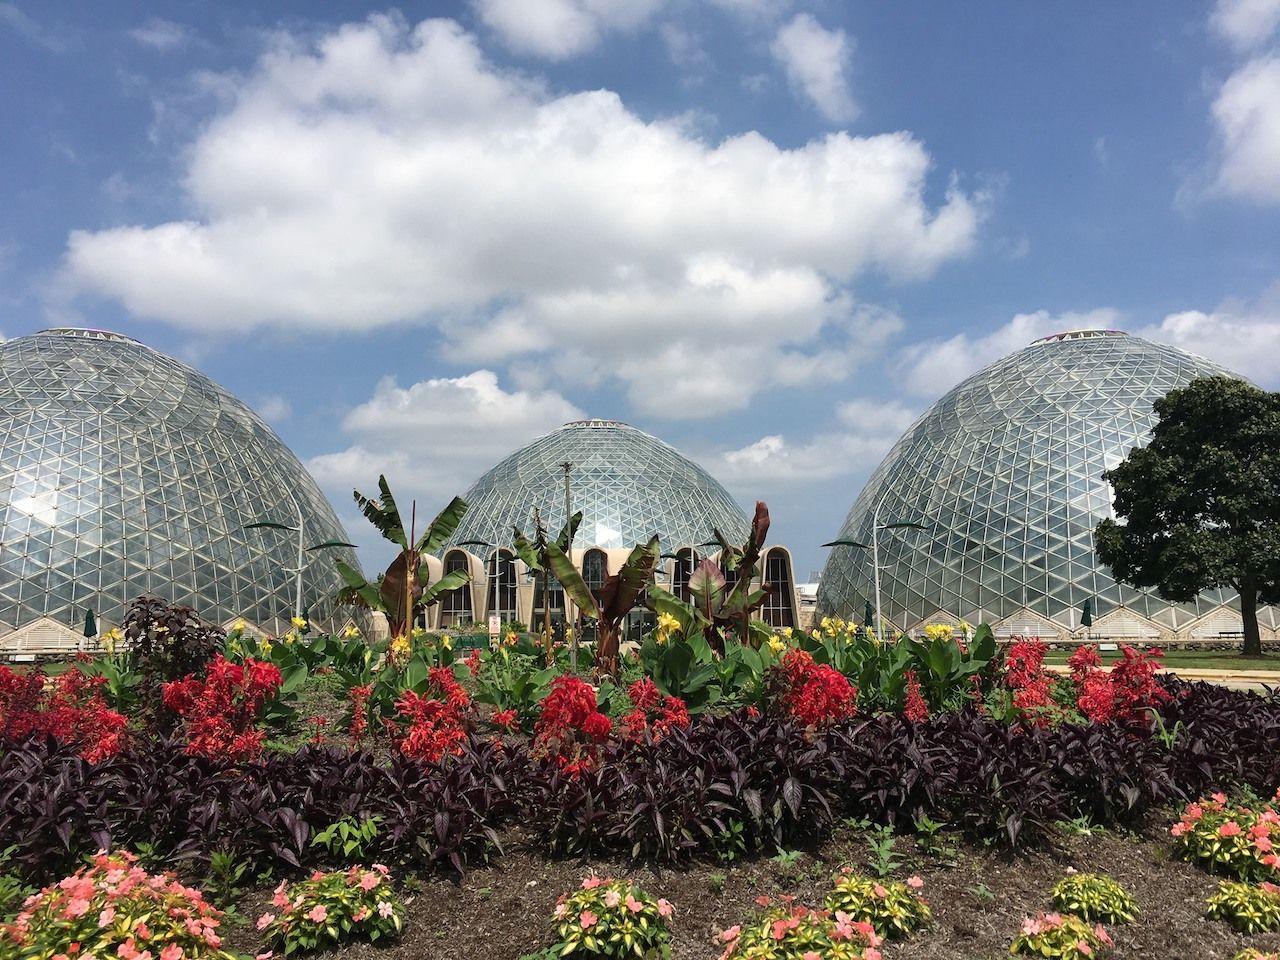 The Milwaukee Domes